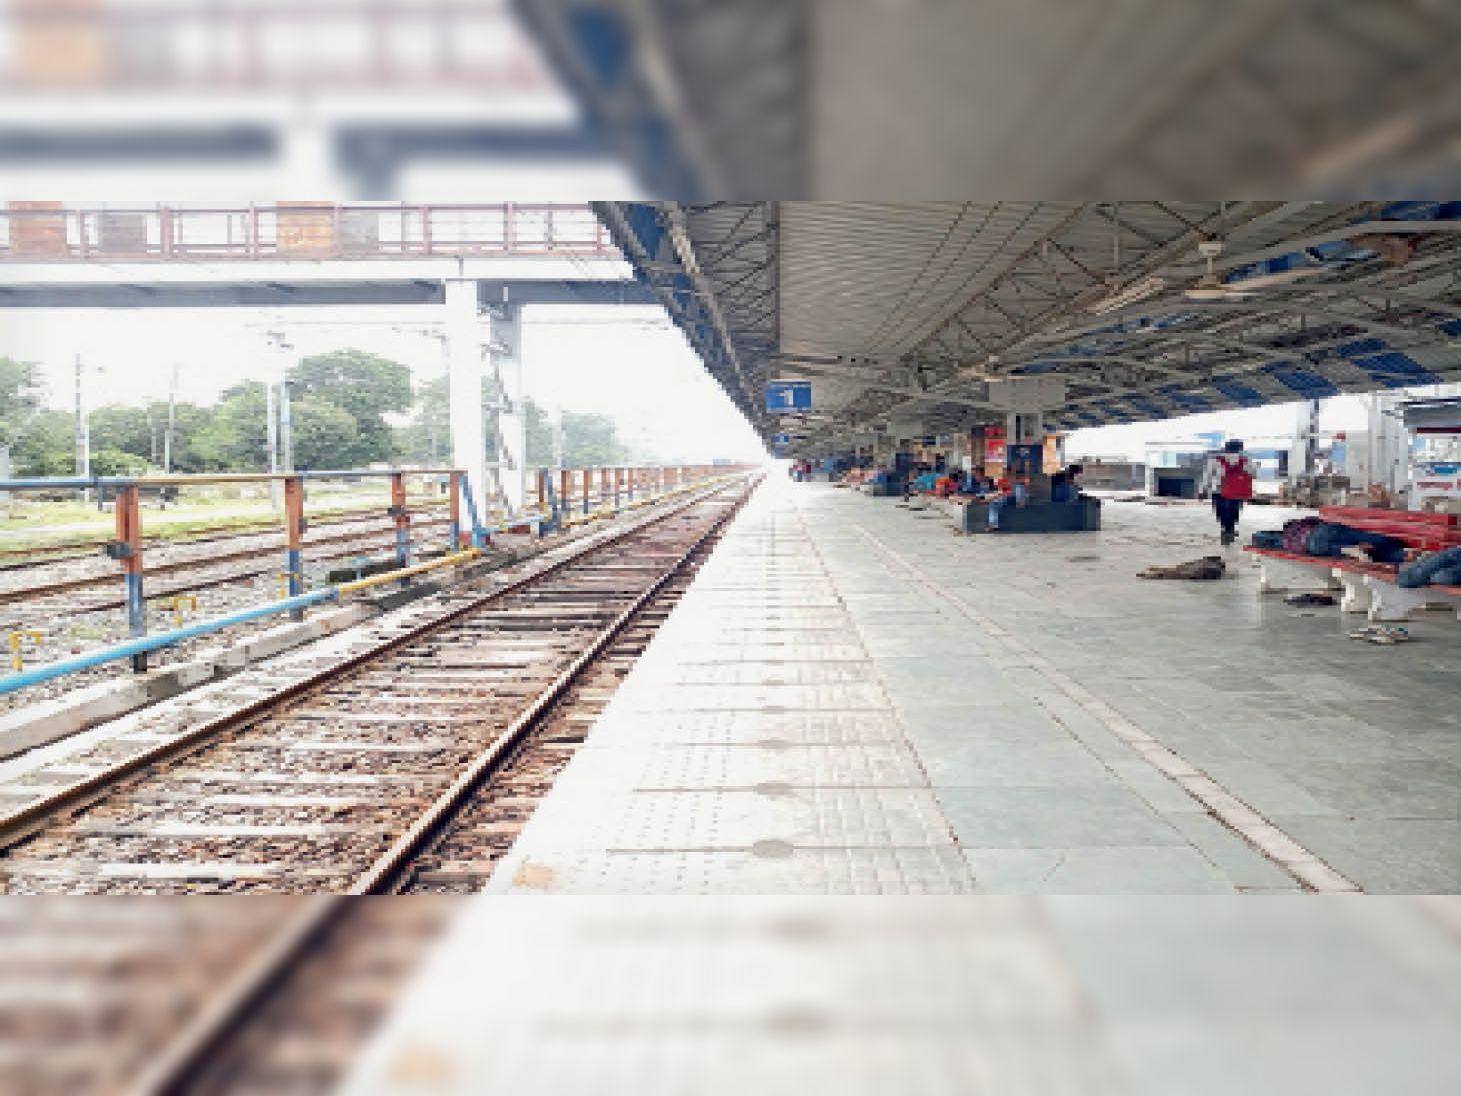 नरकटियागंज रेलवे जंक्शन पर छाई विरानगी। - Dainik Bhaskar